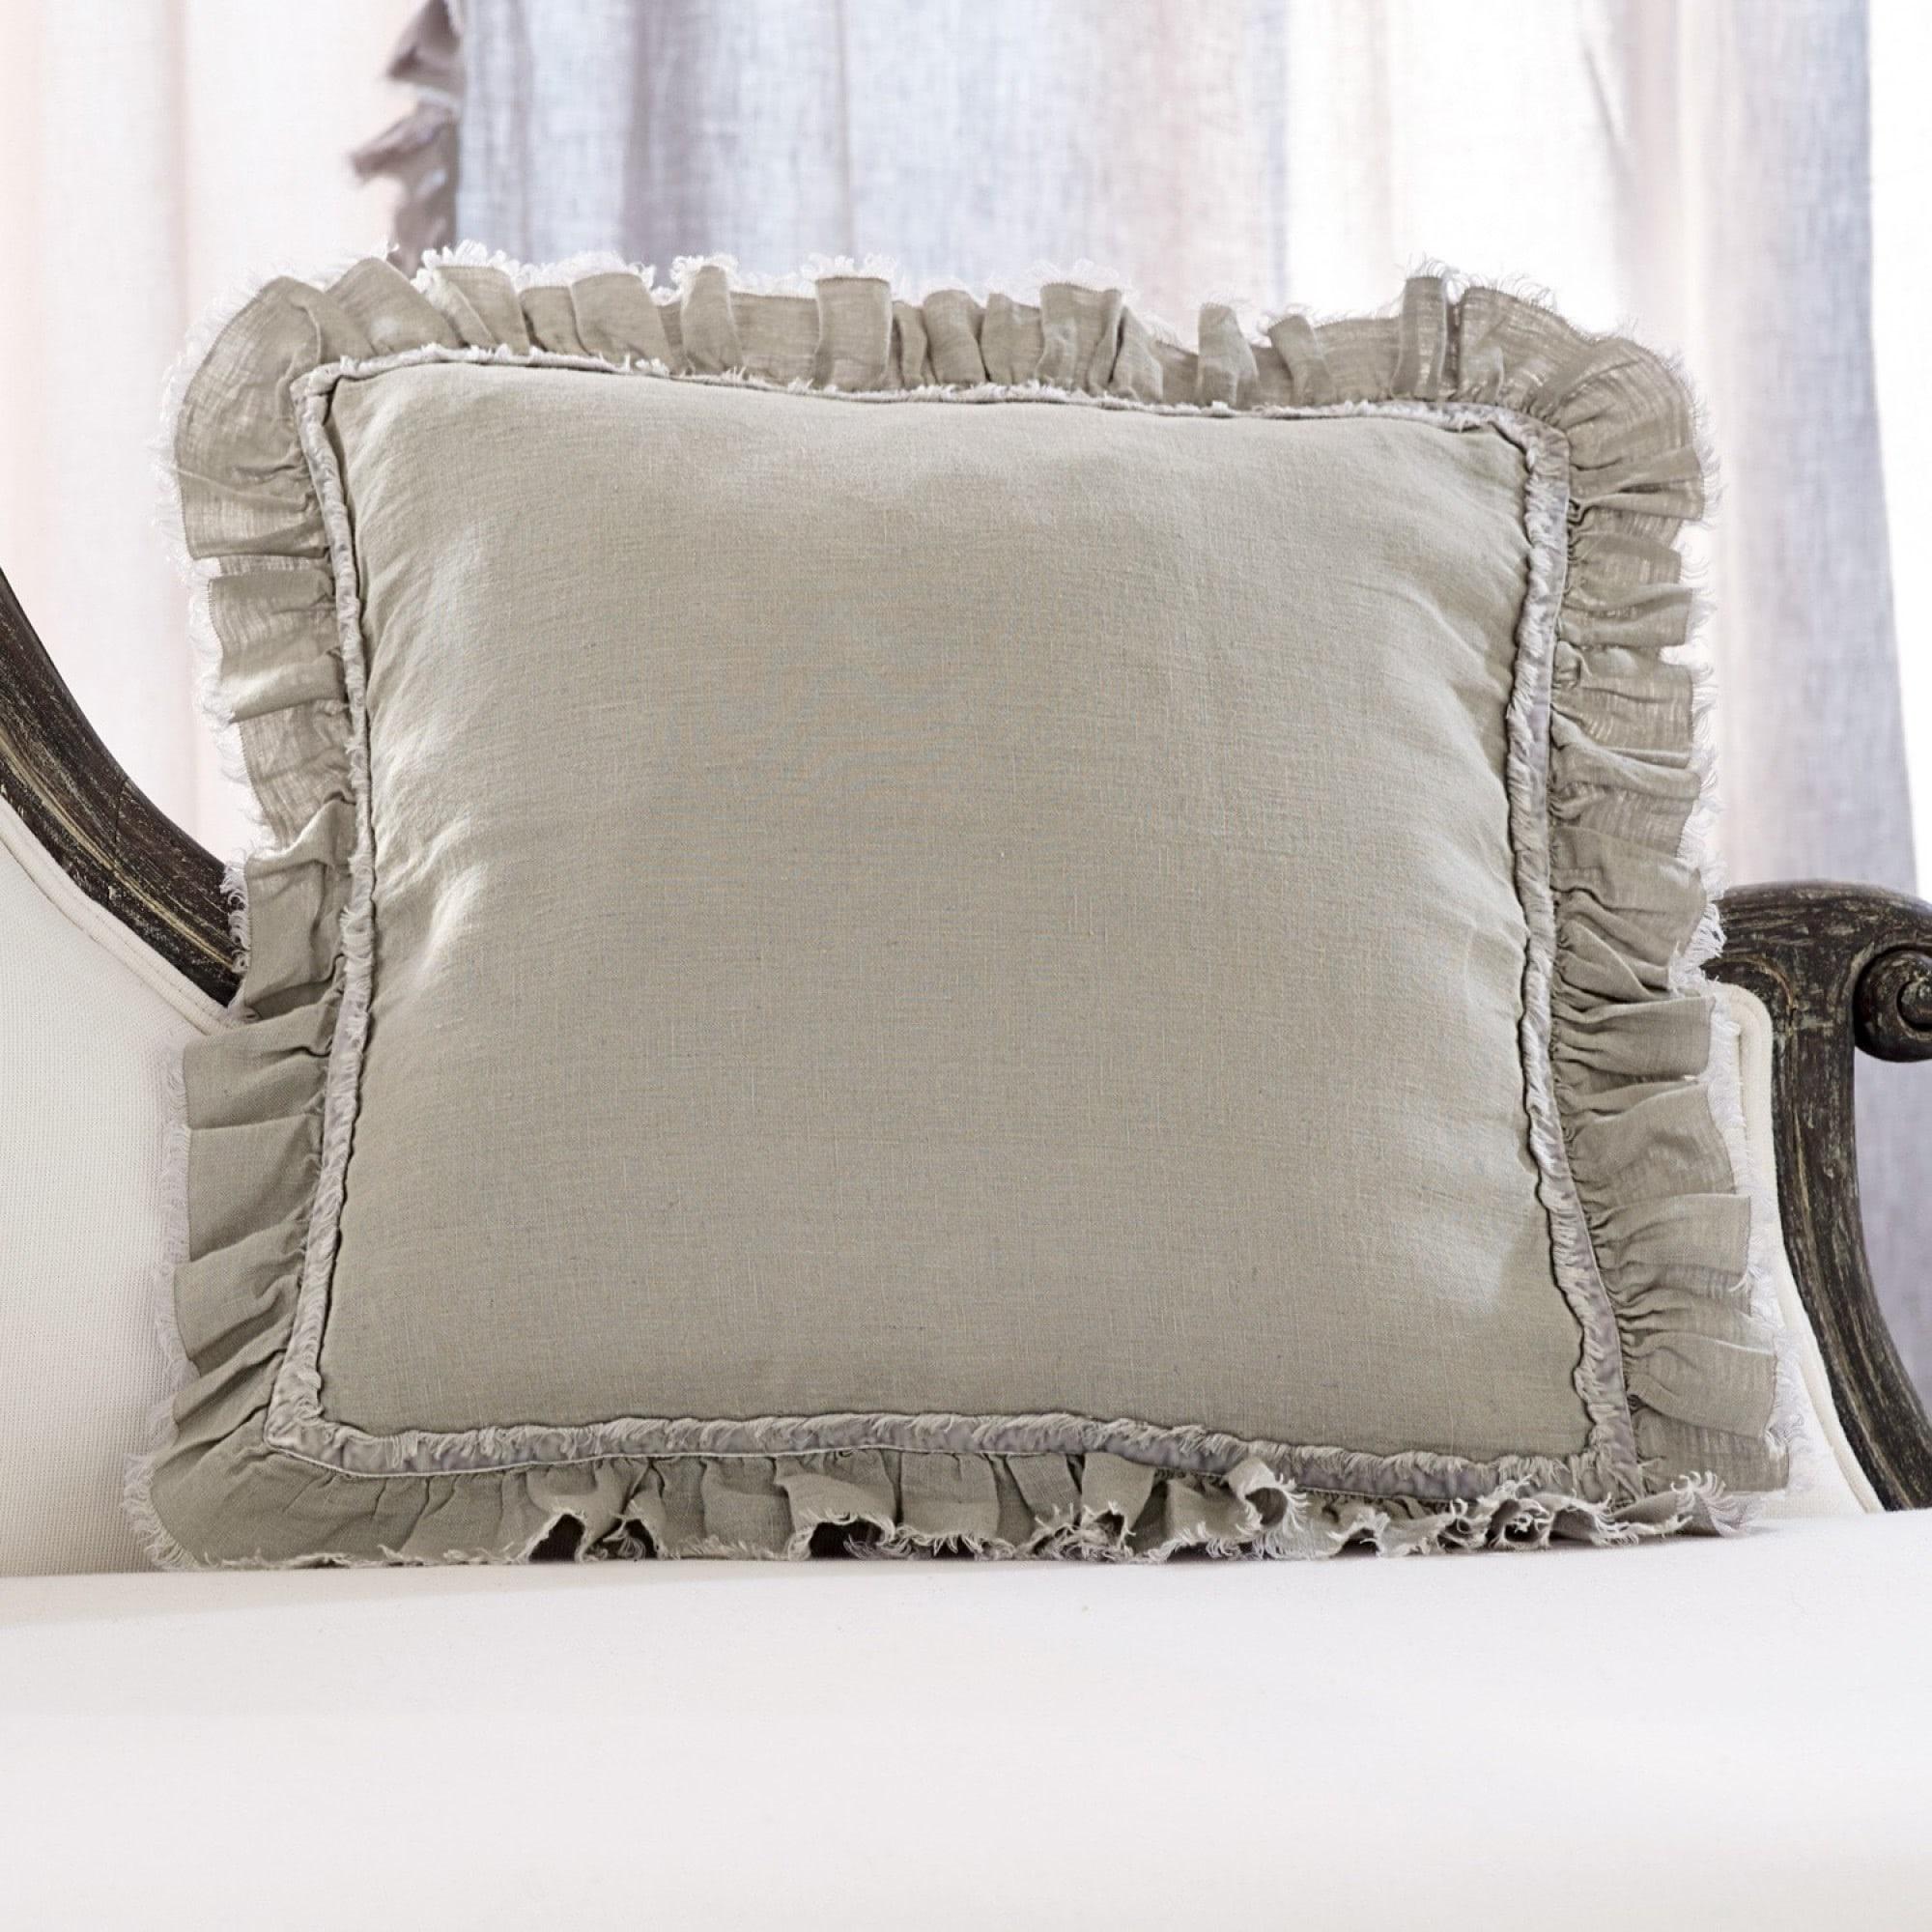 kissenh lle volant loberon coming home. Black Bedroom Furniture Sets. Home Design Ideas